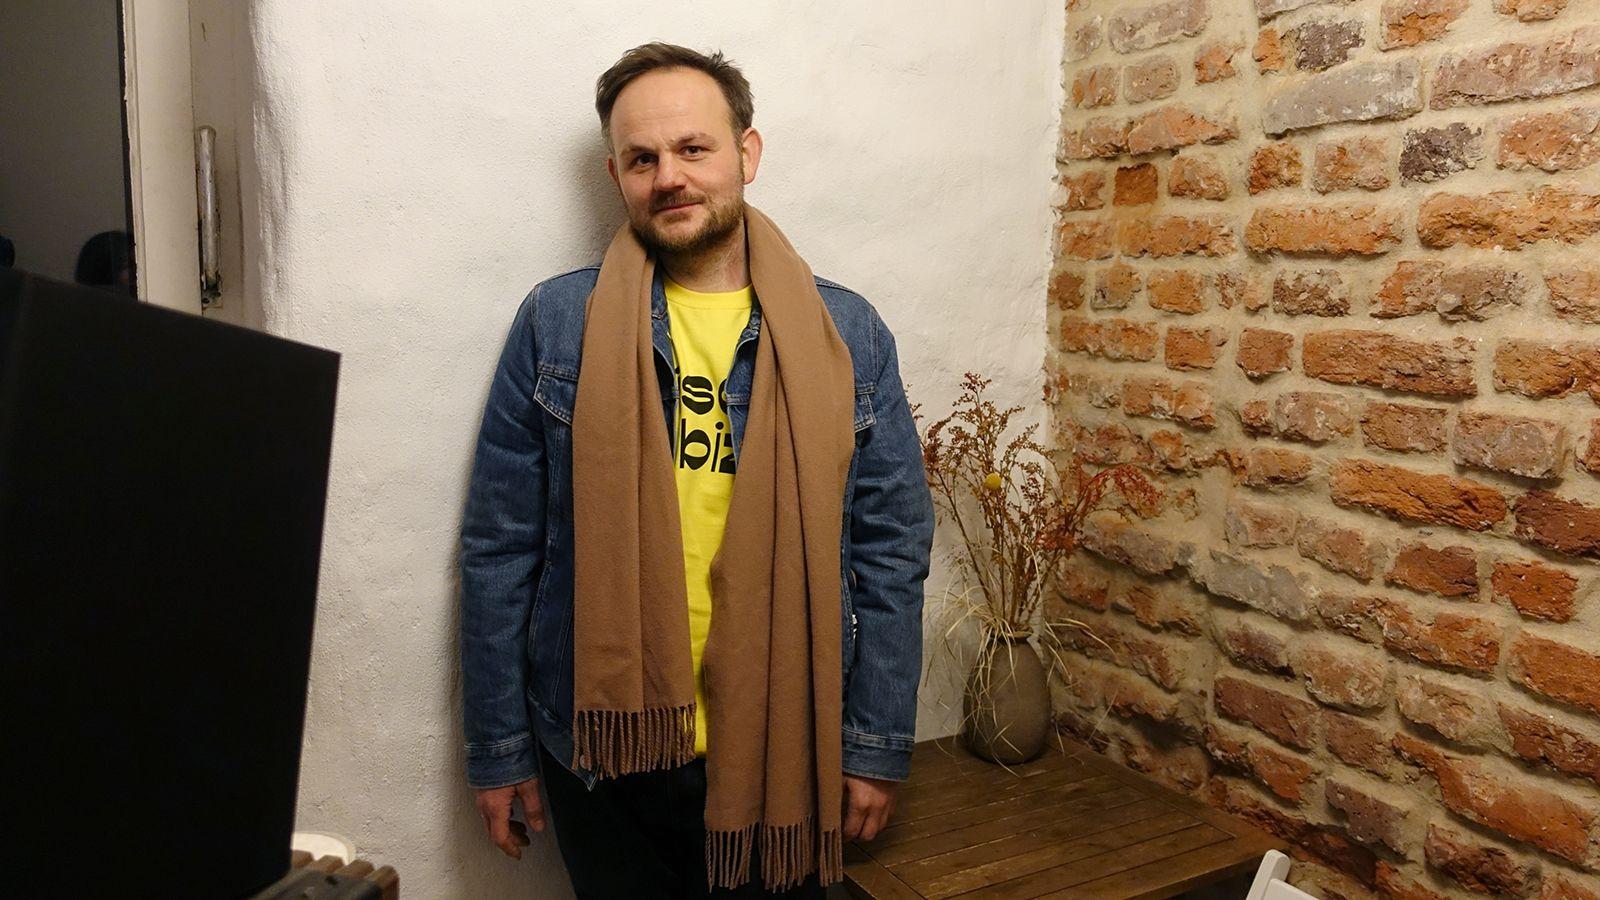 The Conservative, host of Better Days Radio on dublab.de